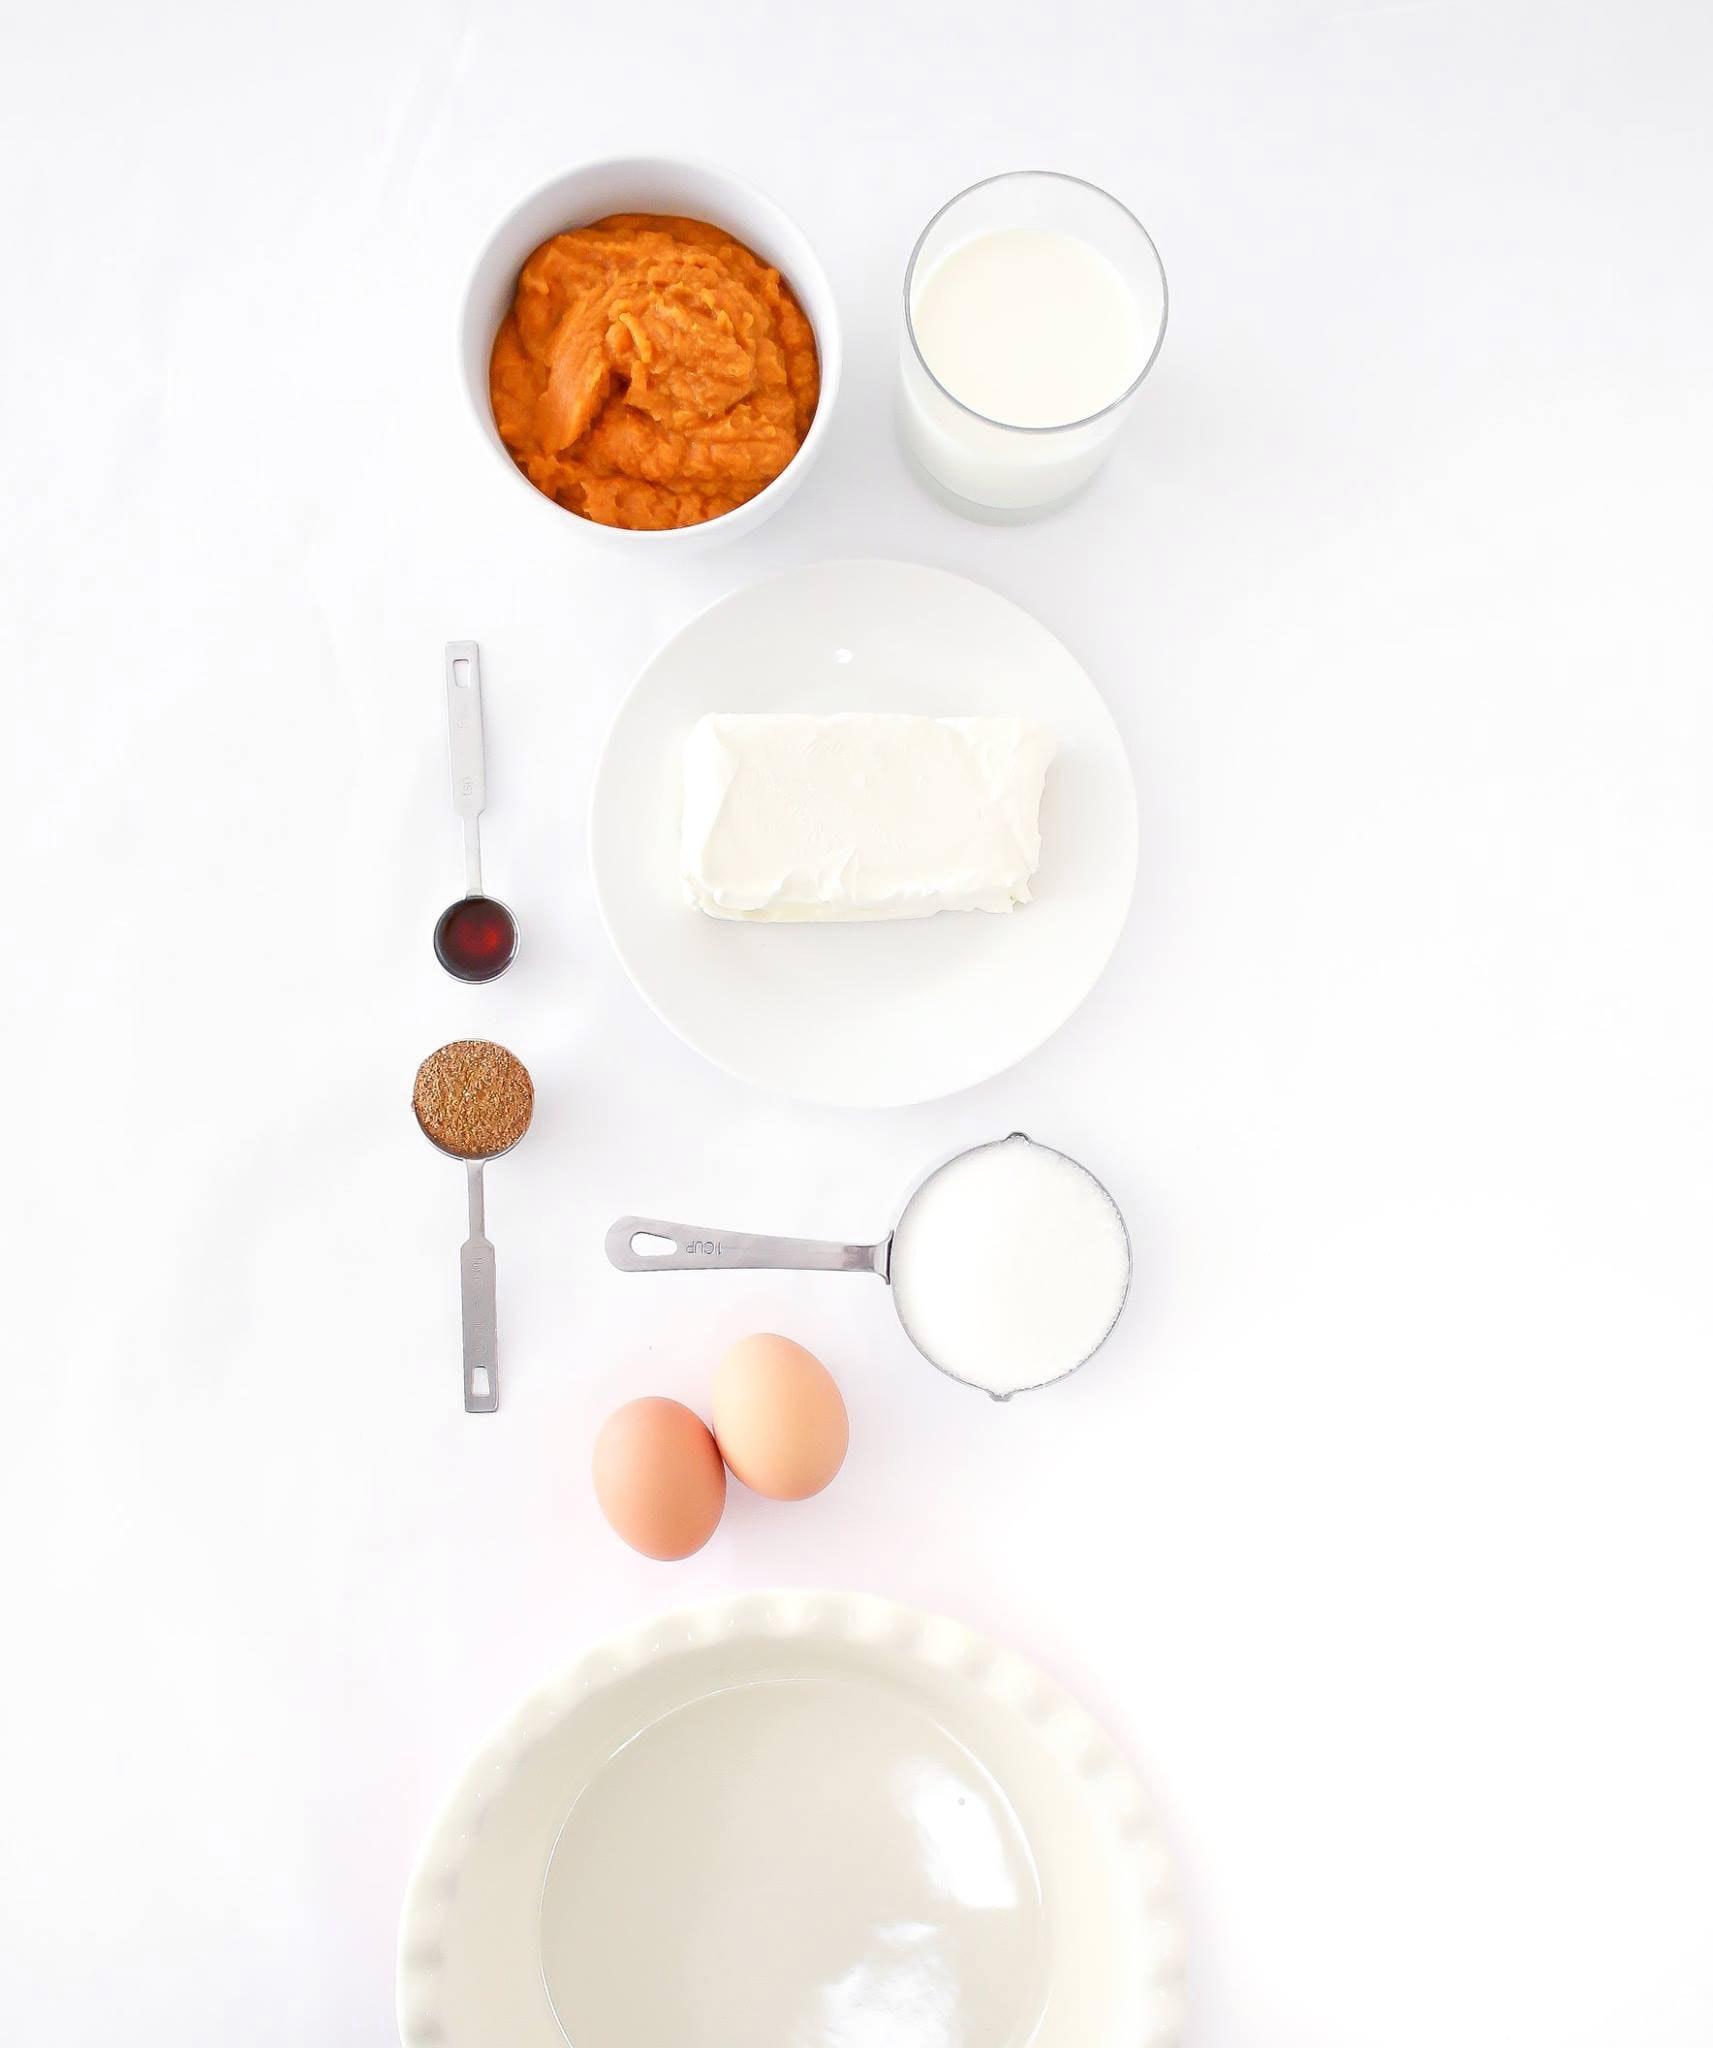 Ingrédients recette Pumpkin Pire tarte au potiron Quo Vadis photo Heather Ford